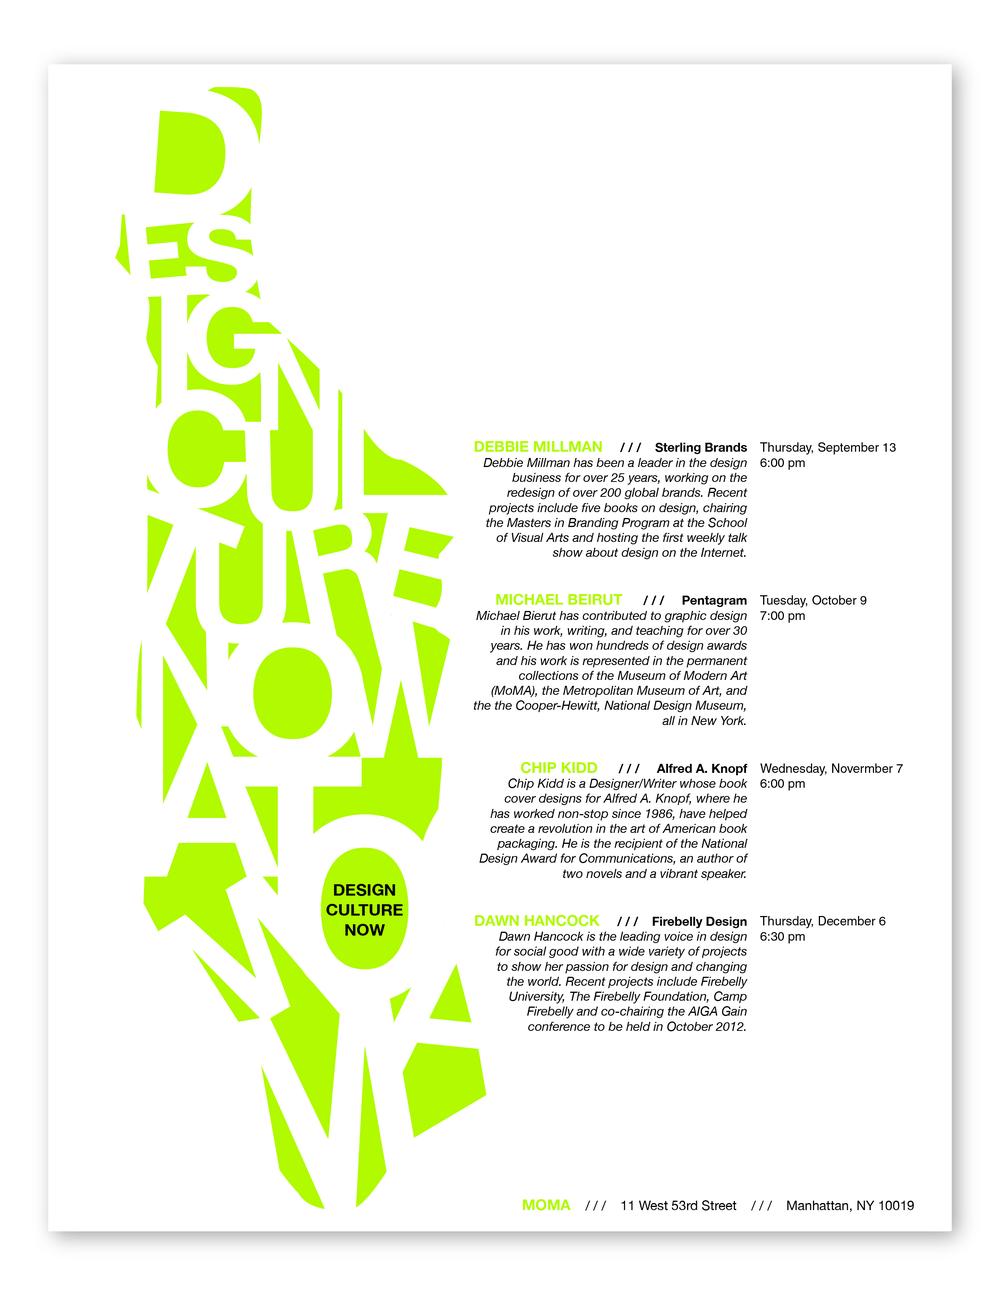 Event Poster | Design Culture Now, Manhattan Silhouette